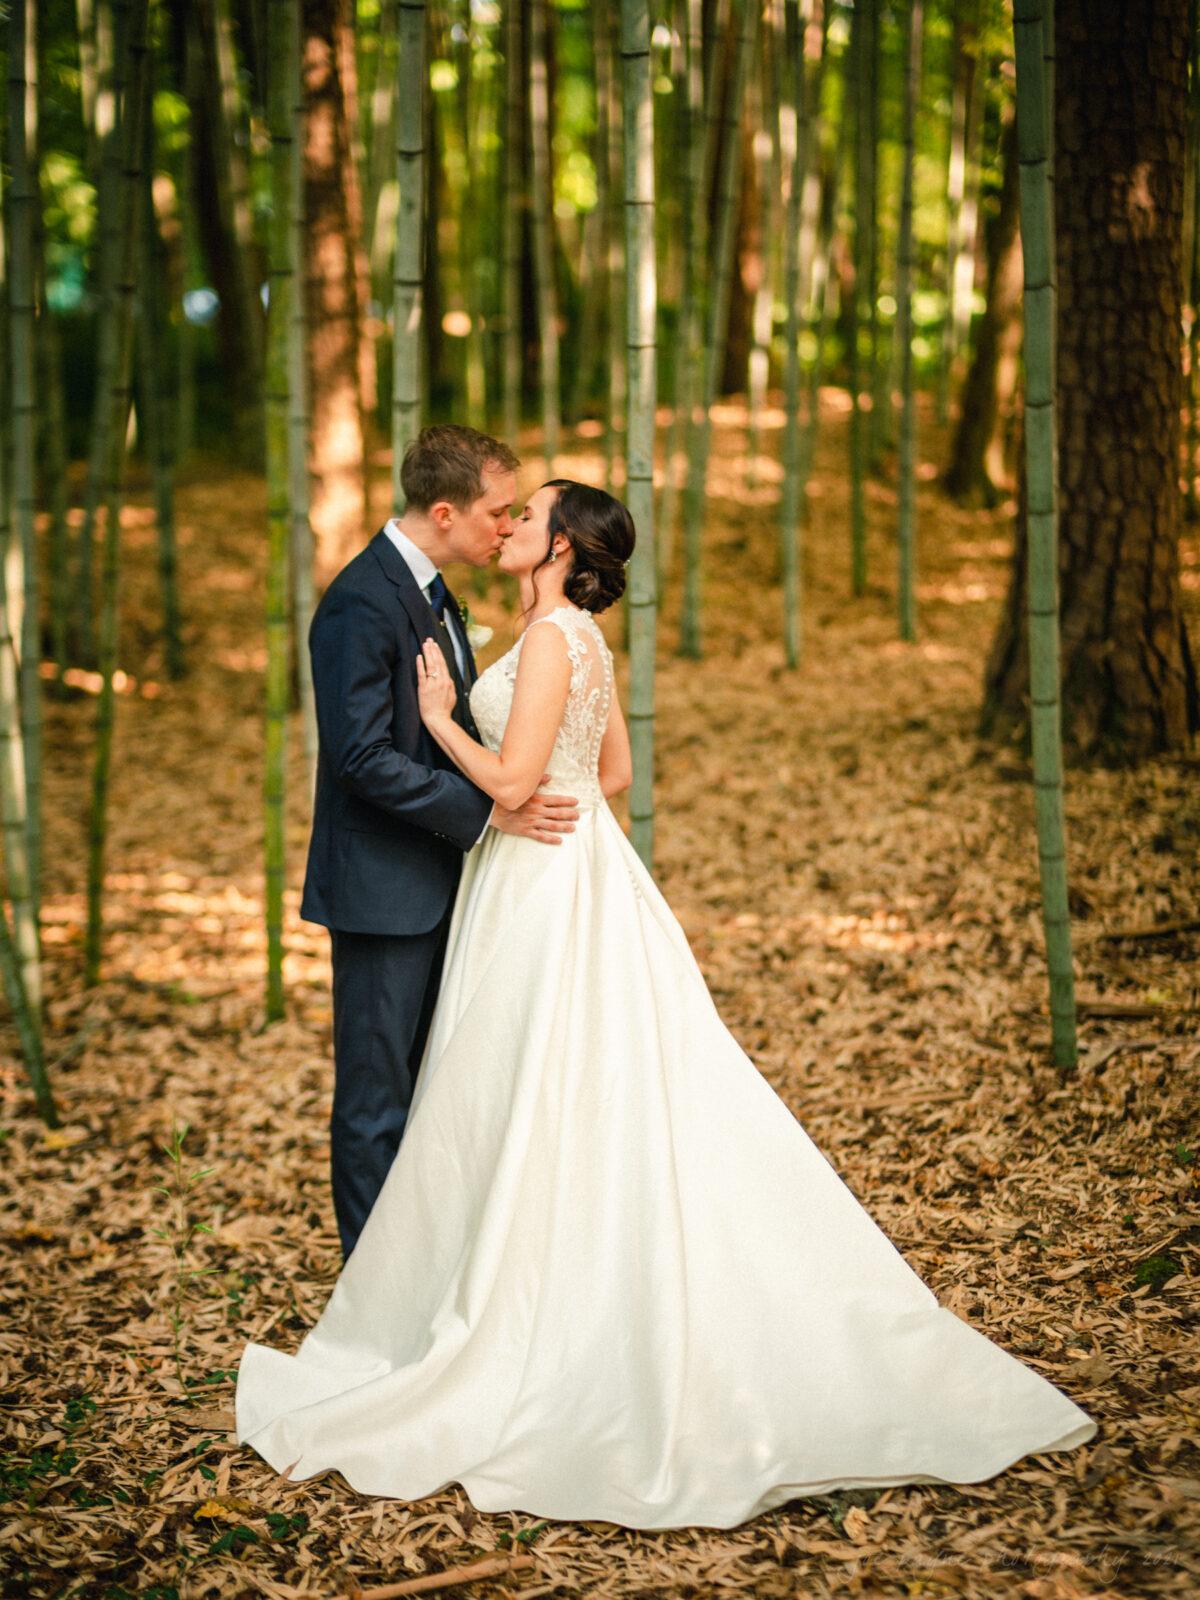 Cotton Room Wedding Photographer Kate Martin 12